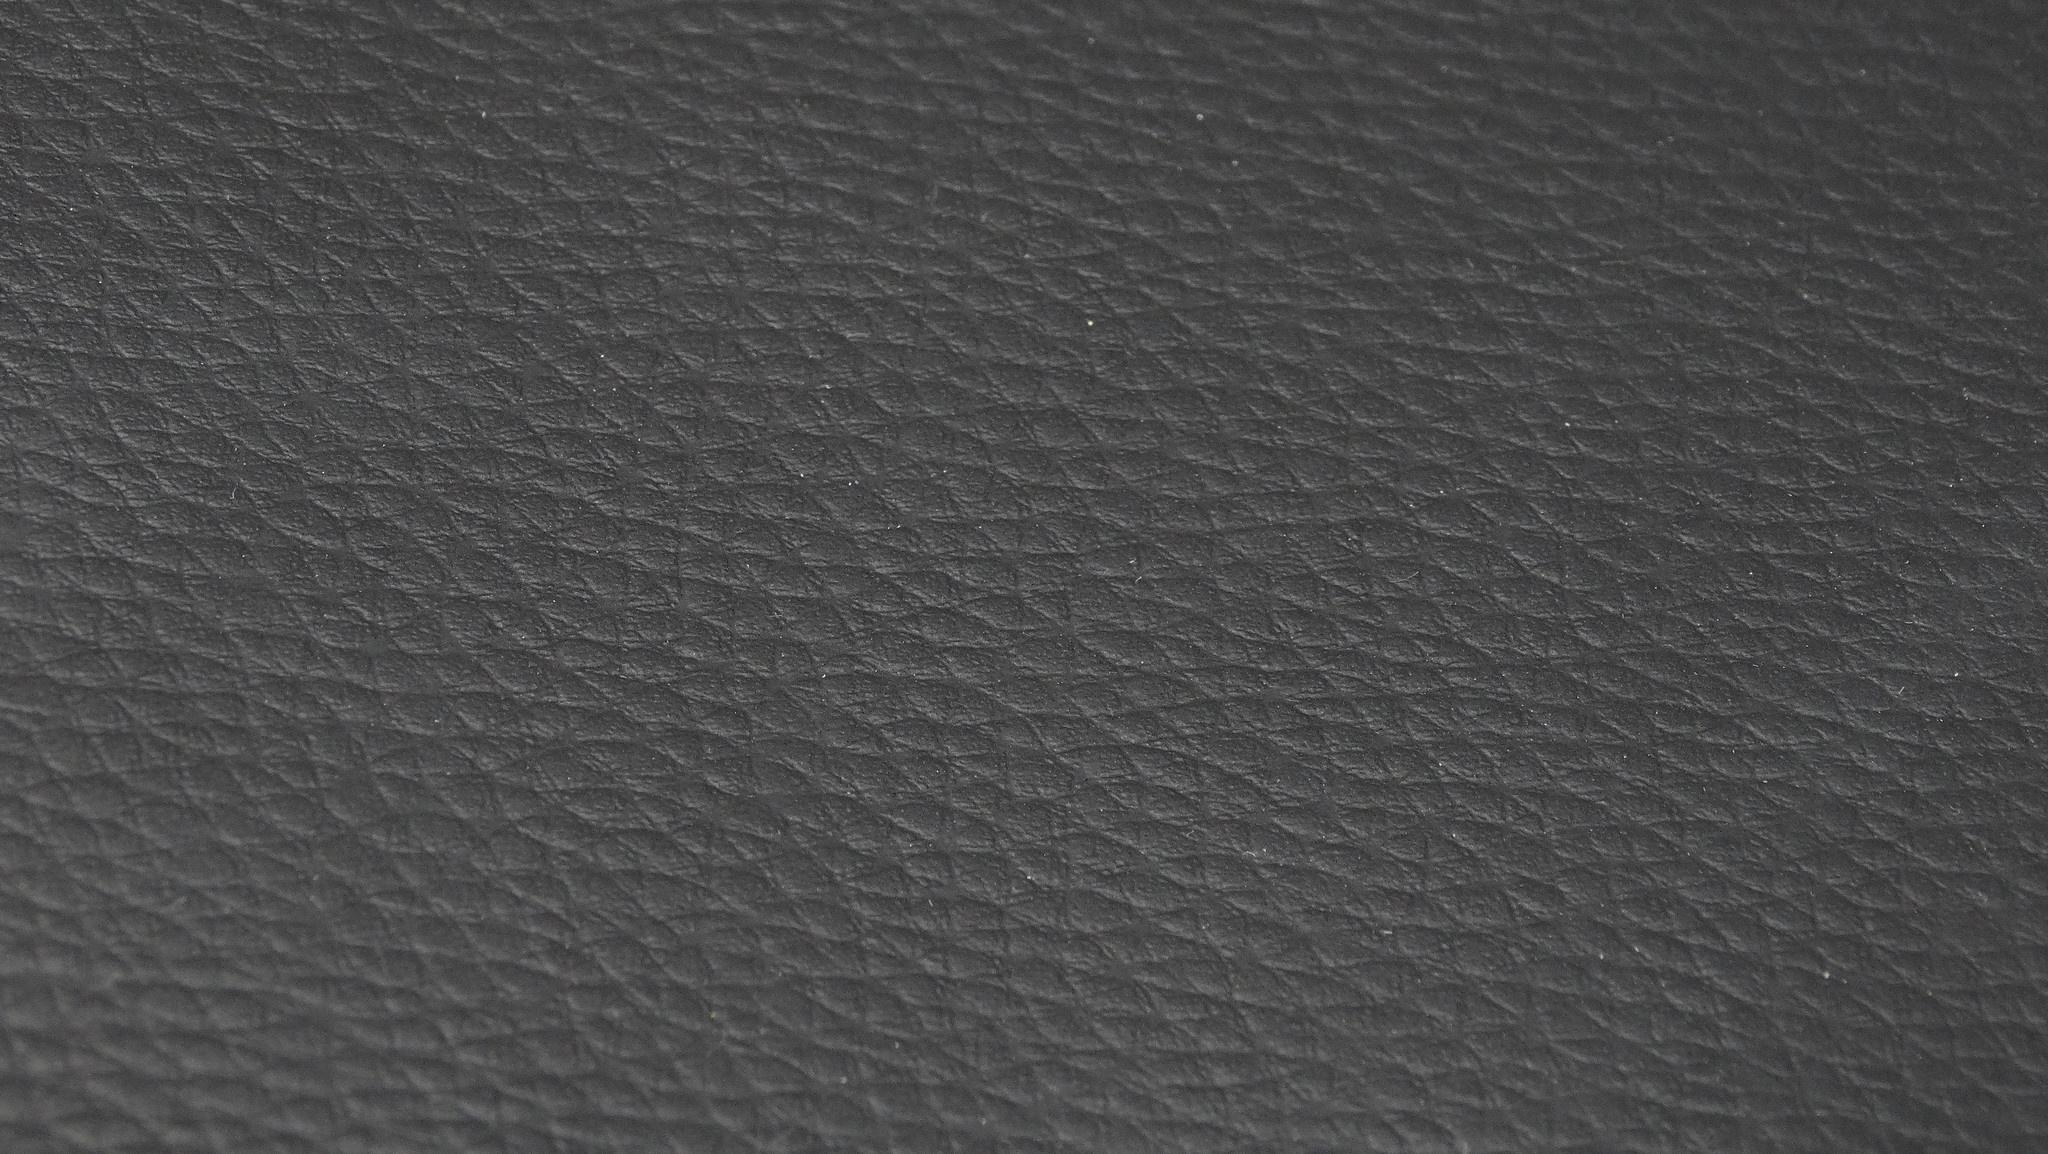 Hundos  Benchkussen maat L 102x67x6 cm.